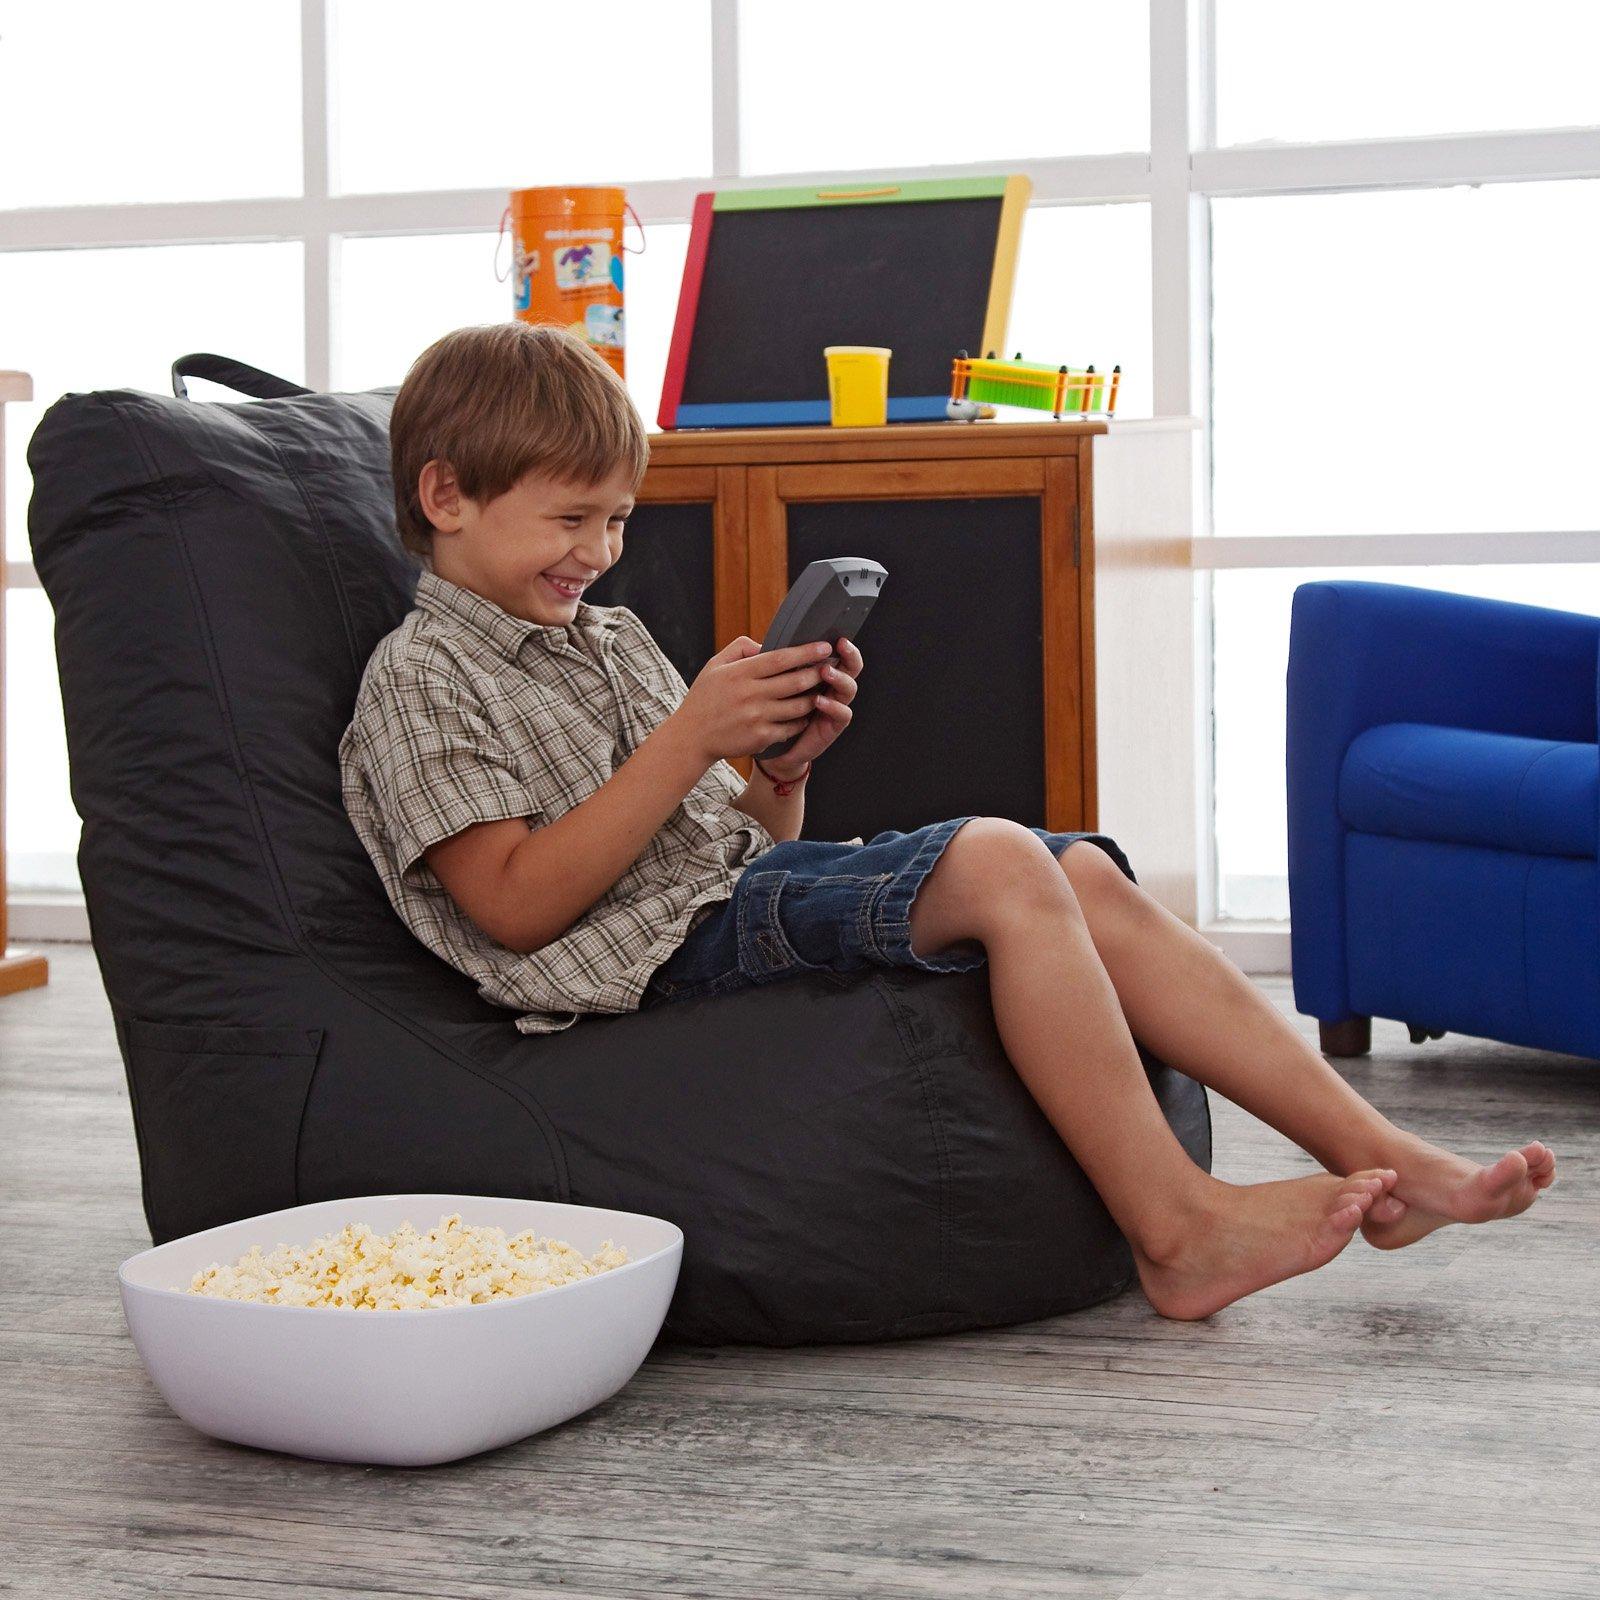 2 le meilleur fauteuil moderne en avr 2018. Black Bedroom Furniture Sets. Home Design Ideas